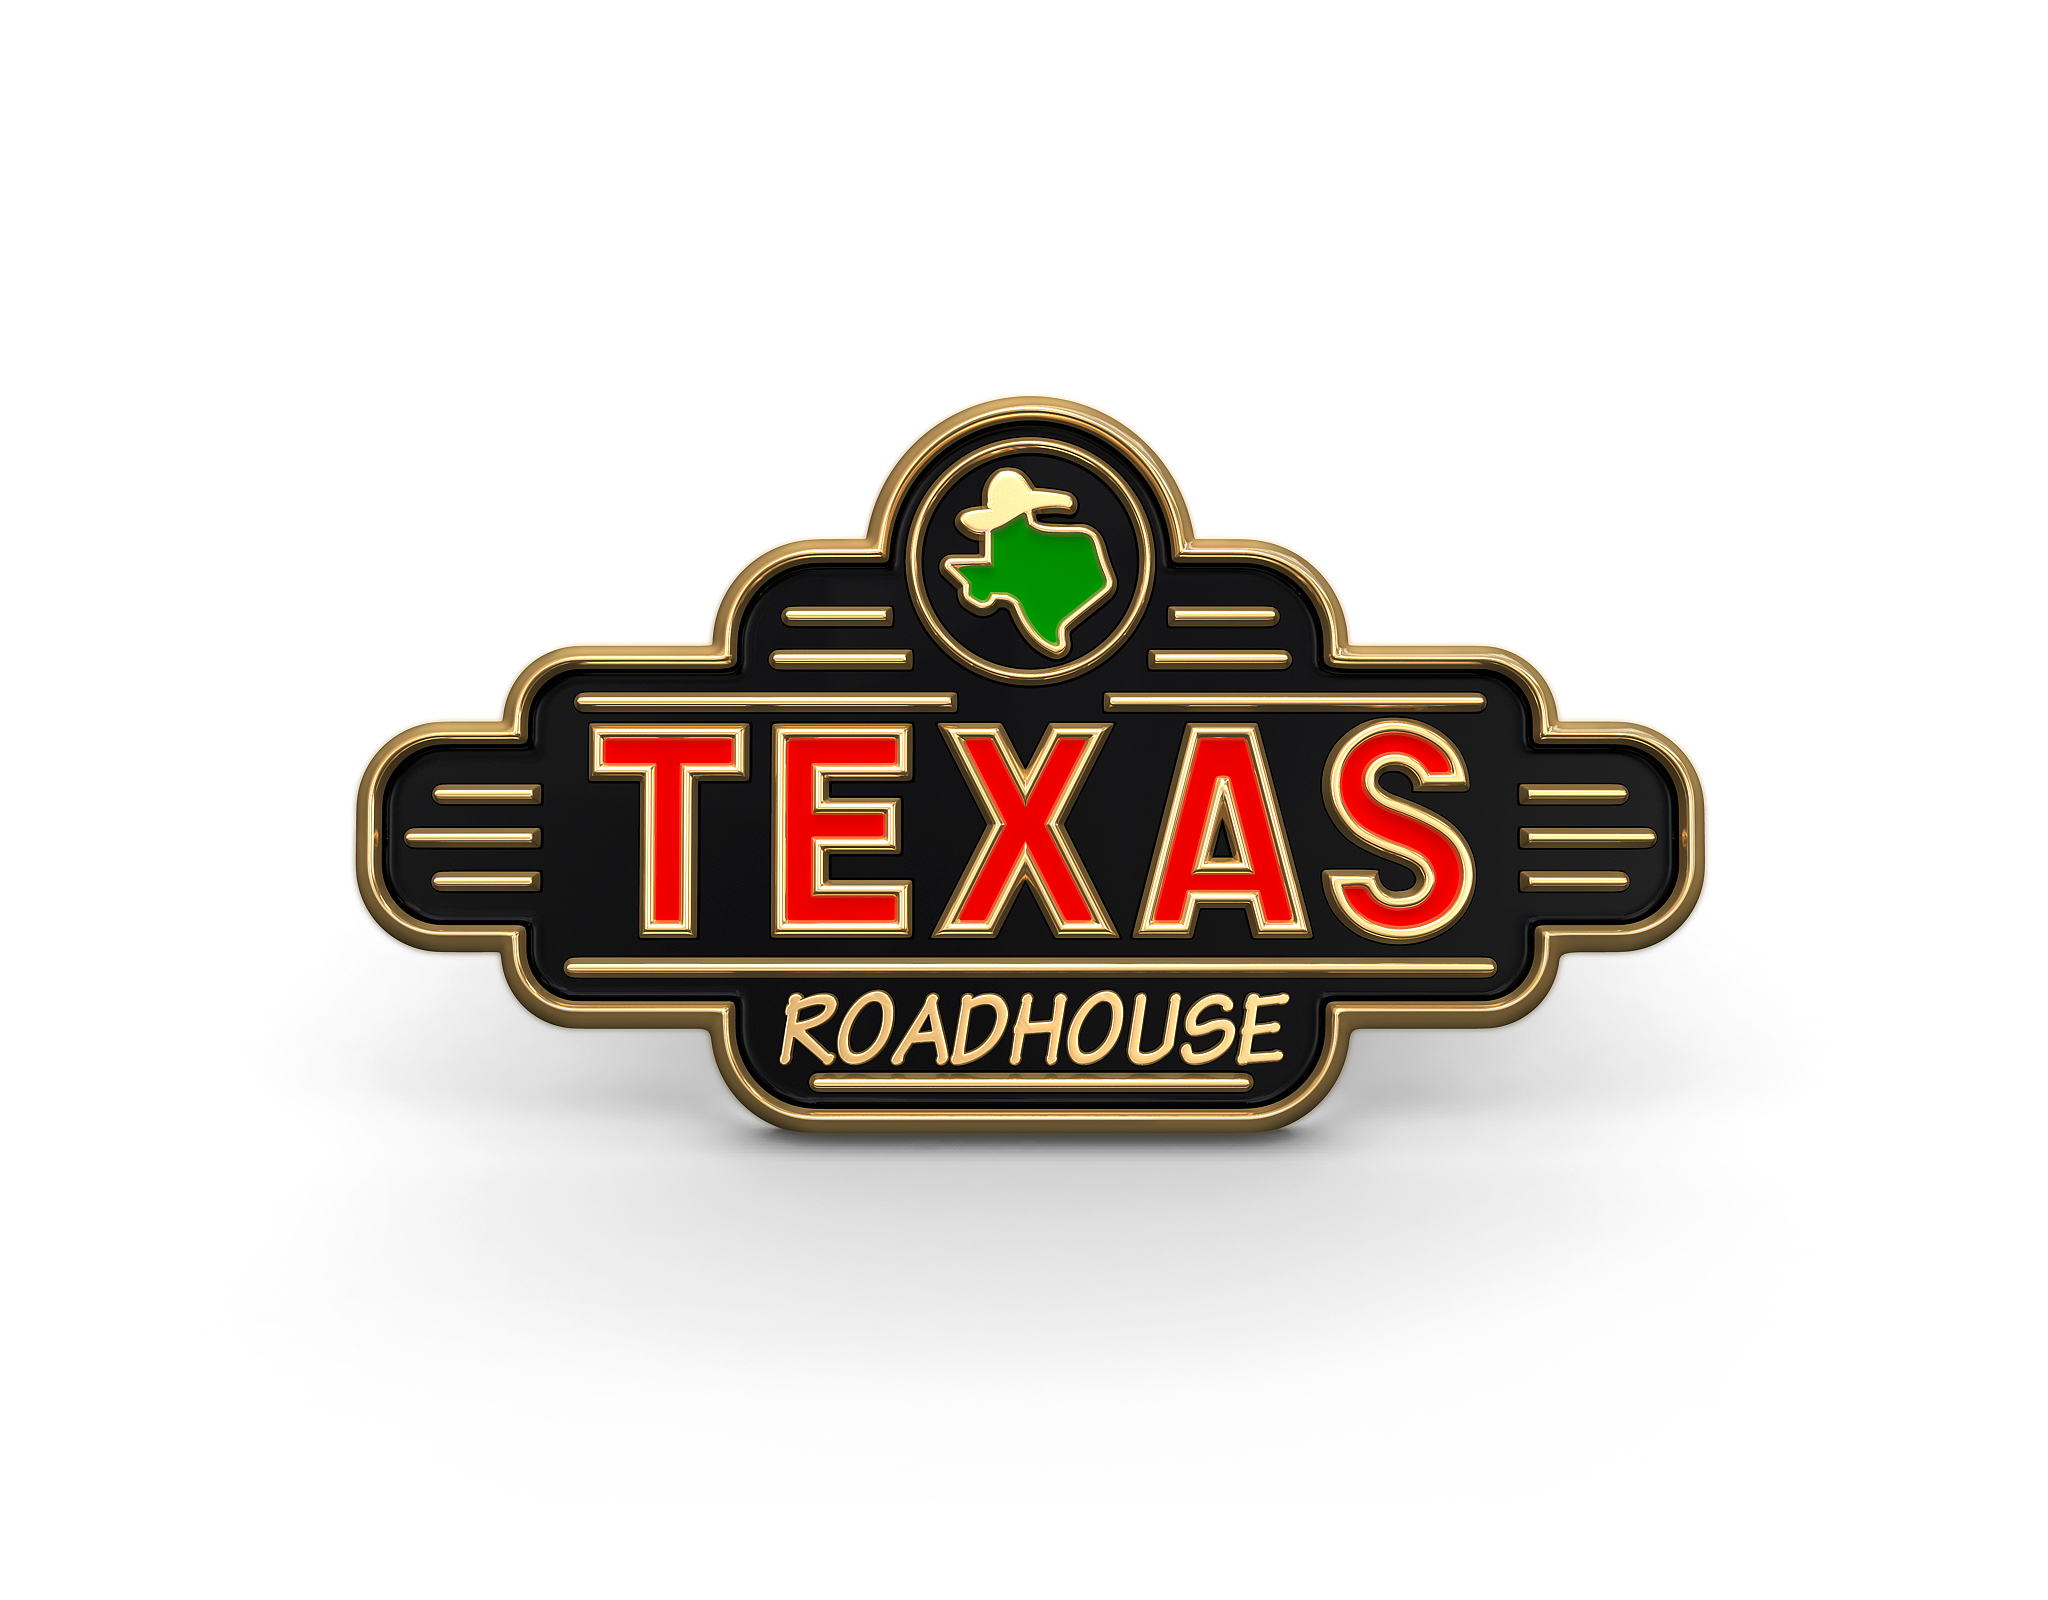 Updated_RoadHouse_PLUS_Alpha.jpg